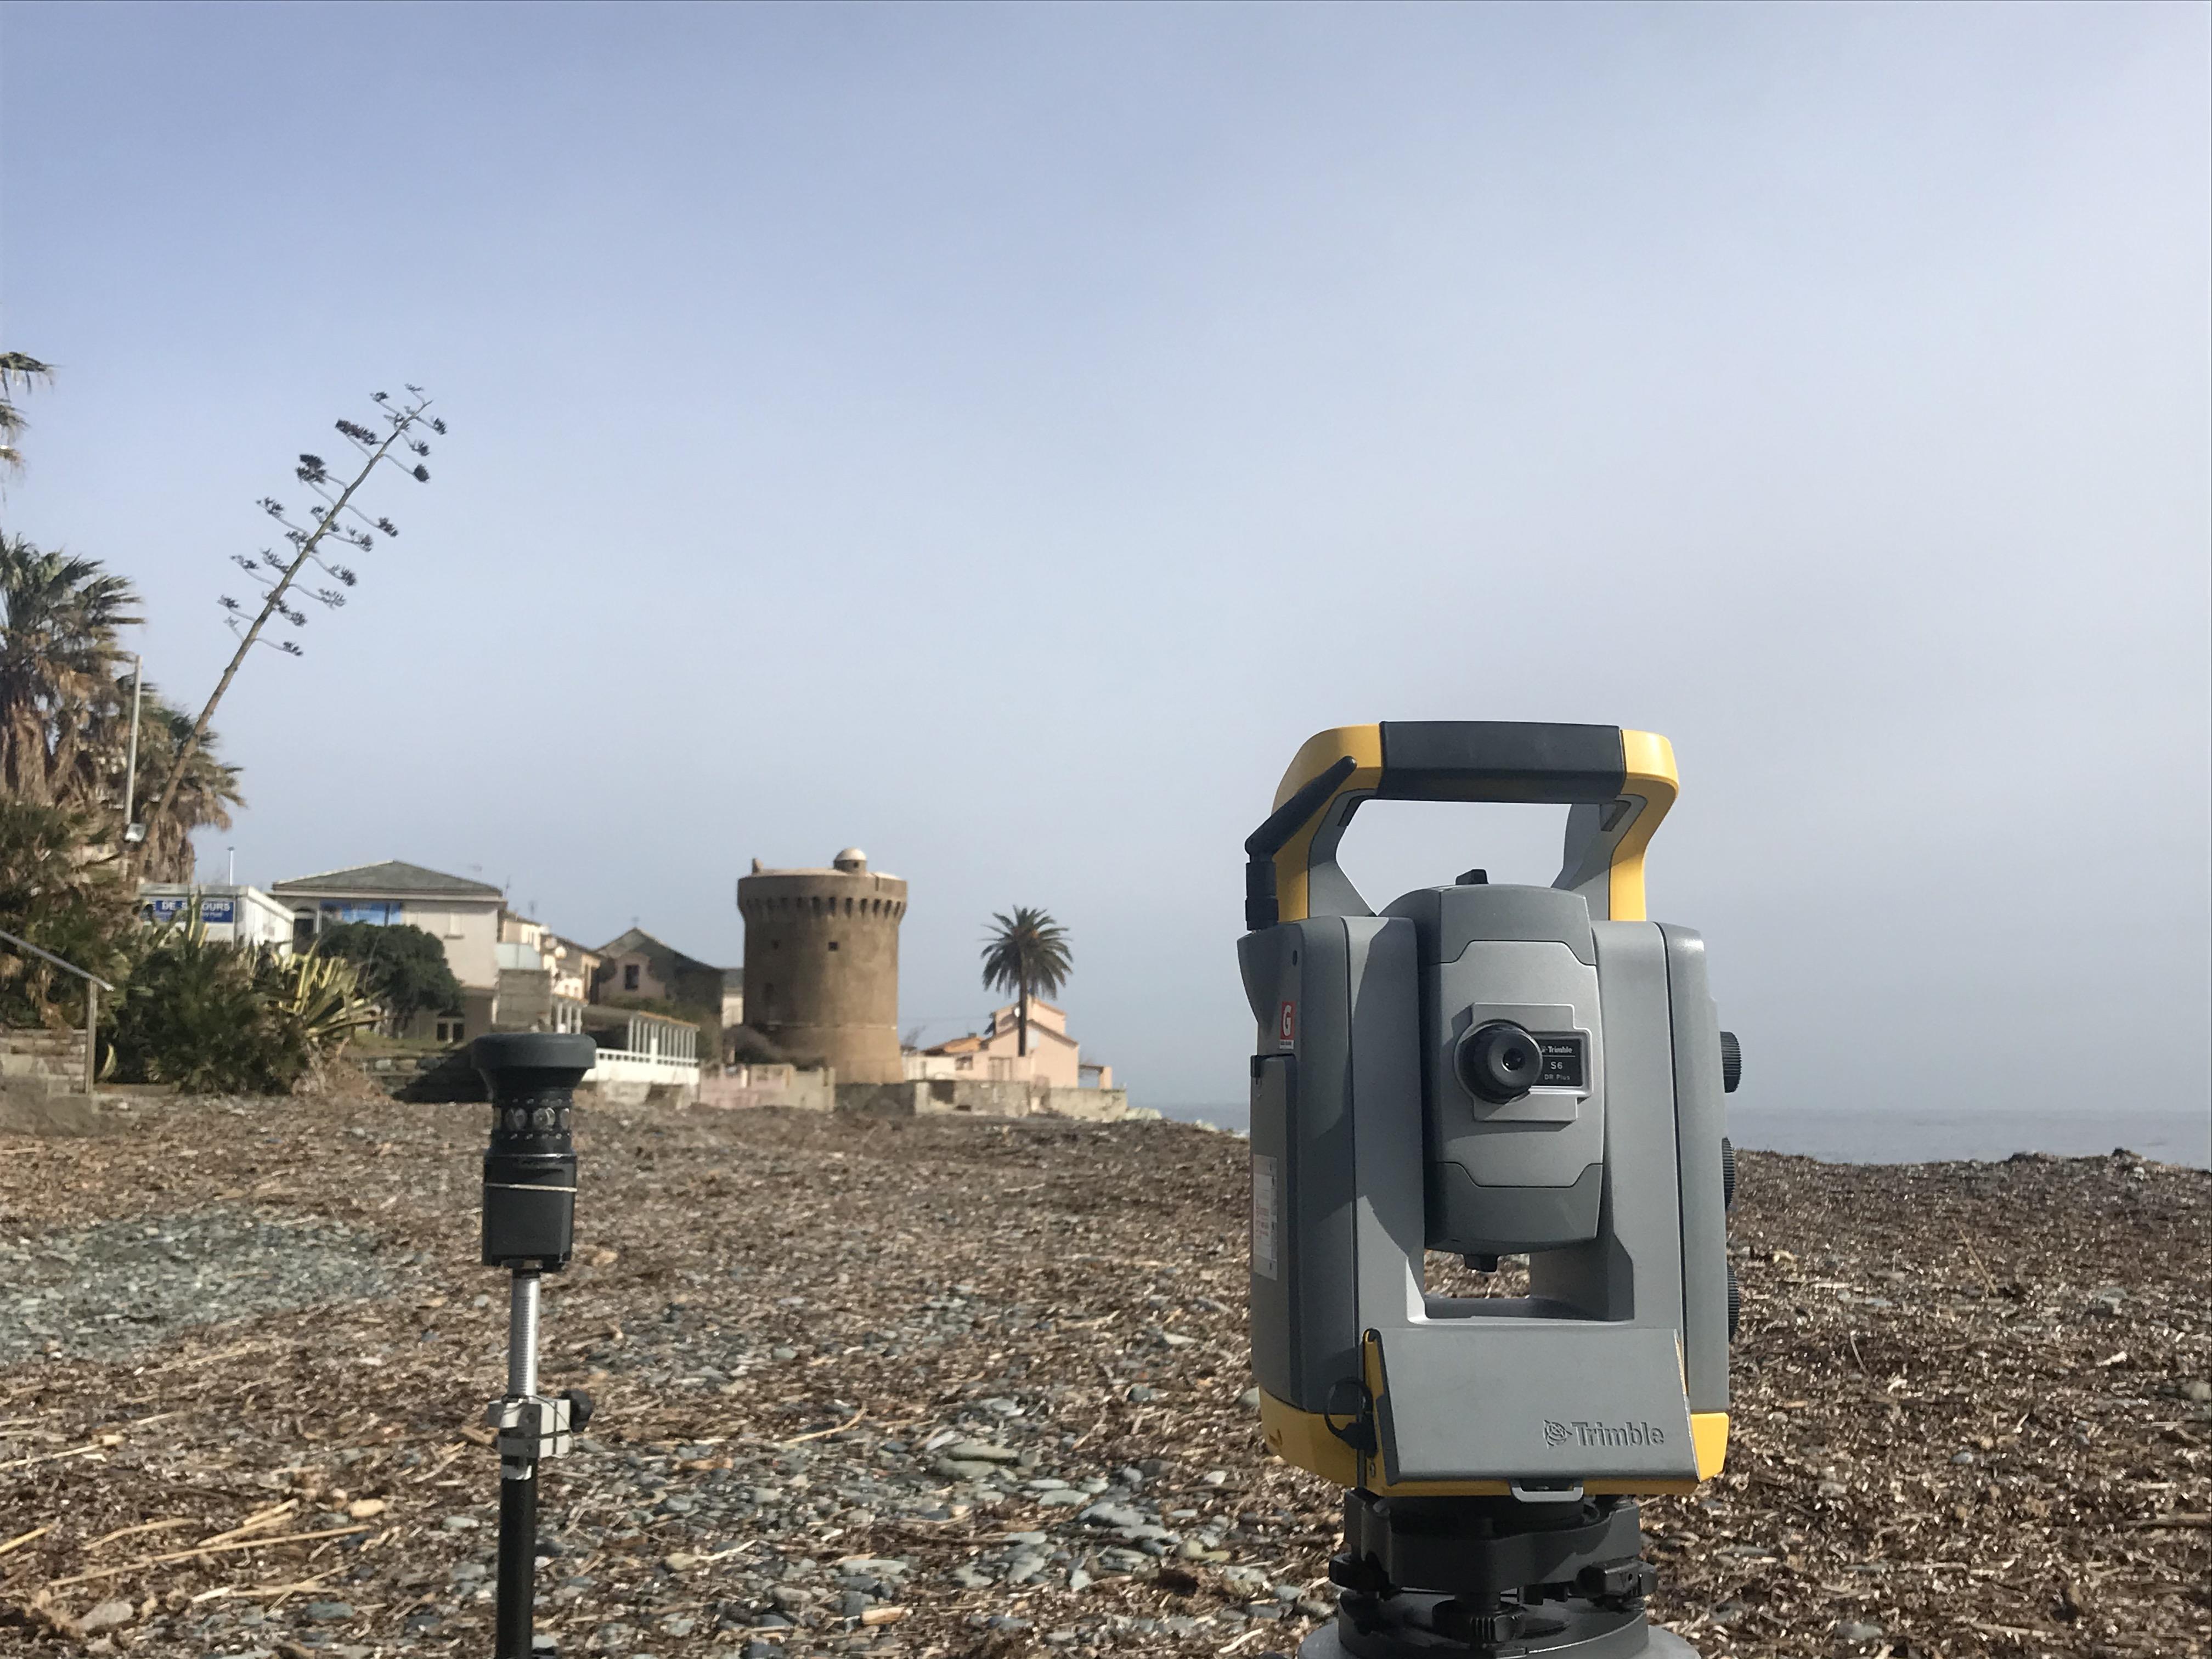 SANTA MARIA DI LOTA Géomètre-Expert Corse